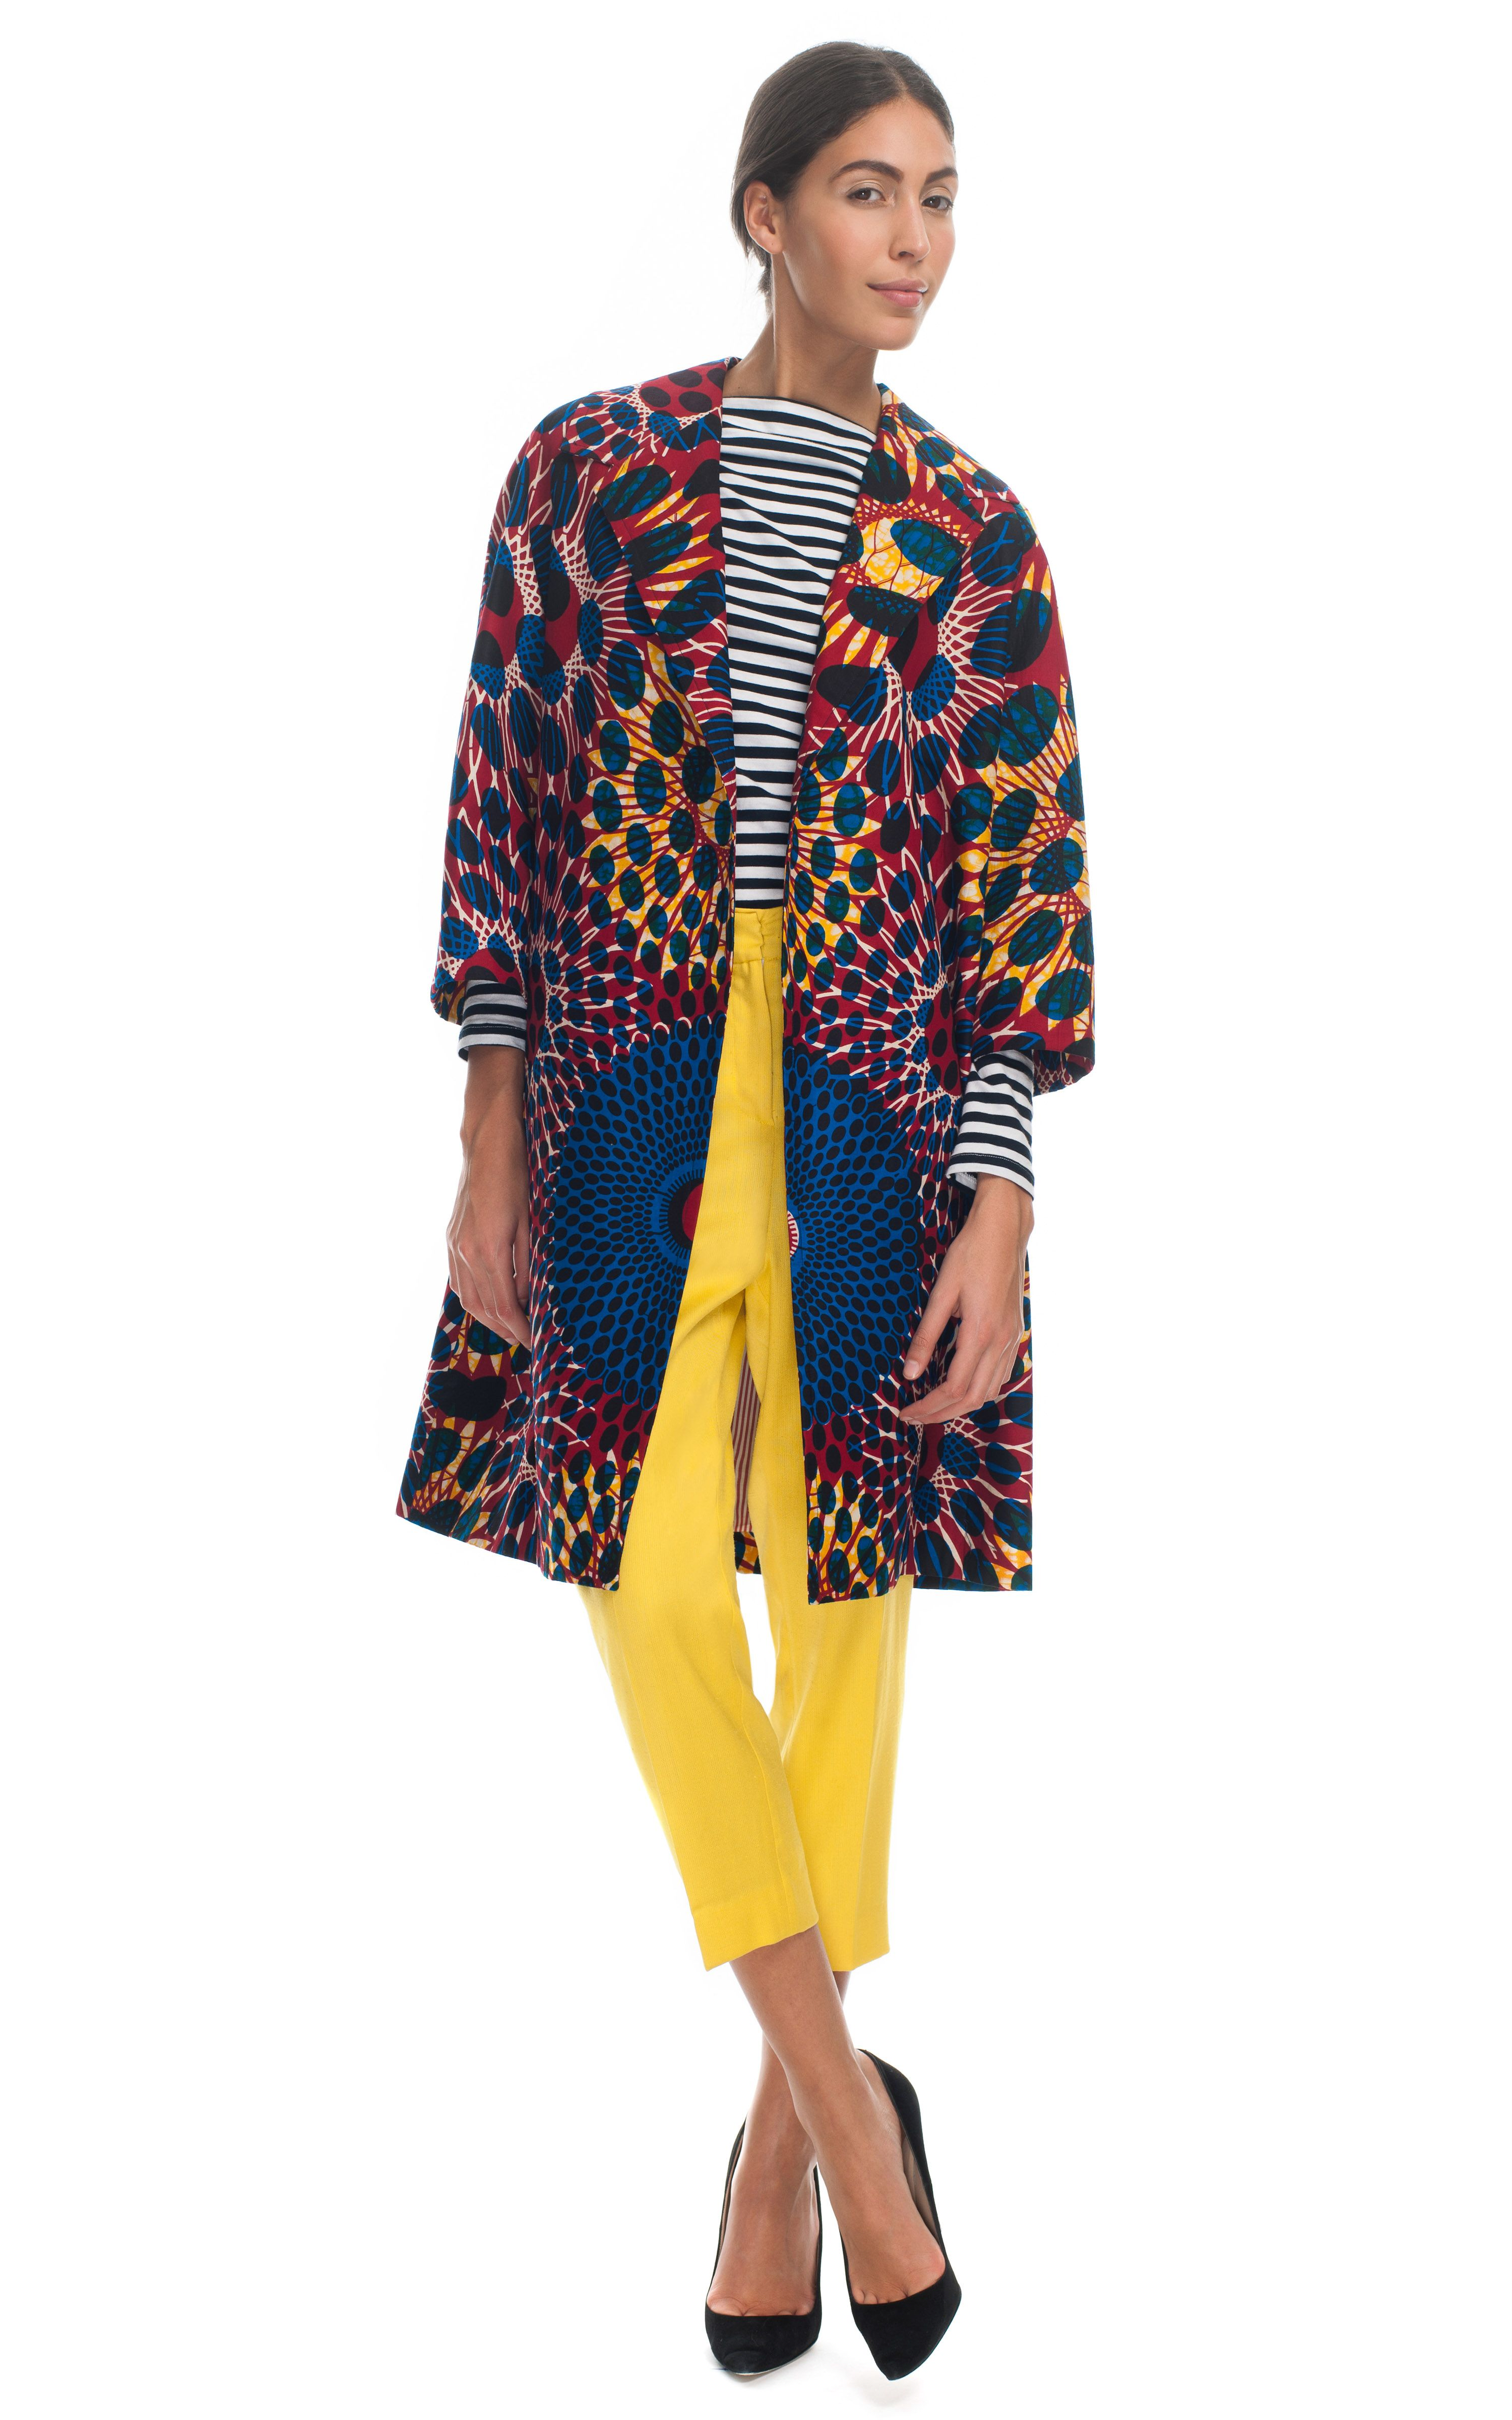 Stella Moda Jean Printed African Cotton Coat Operandi At Wax TCfqwCxO6